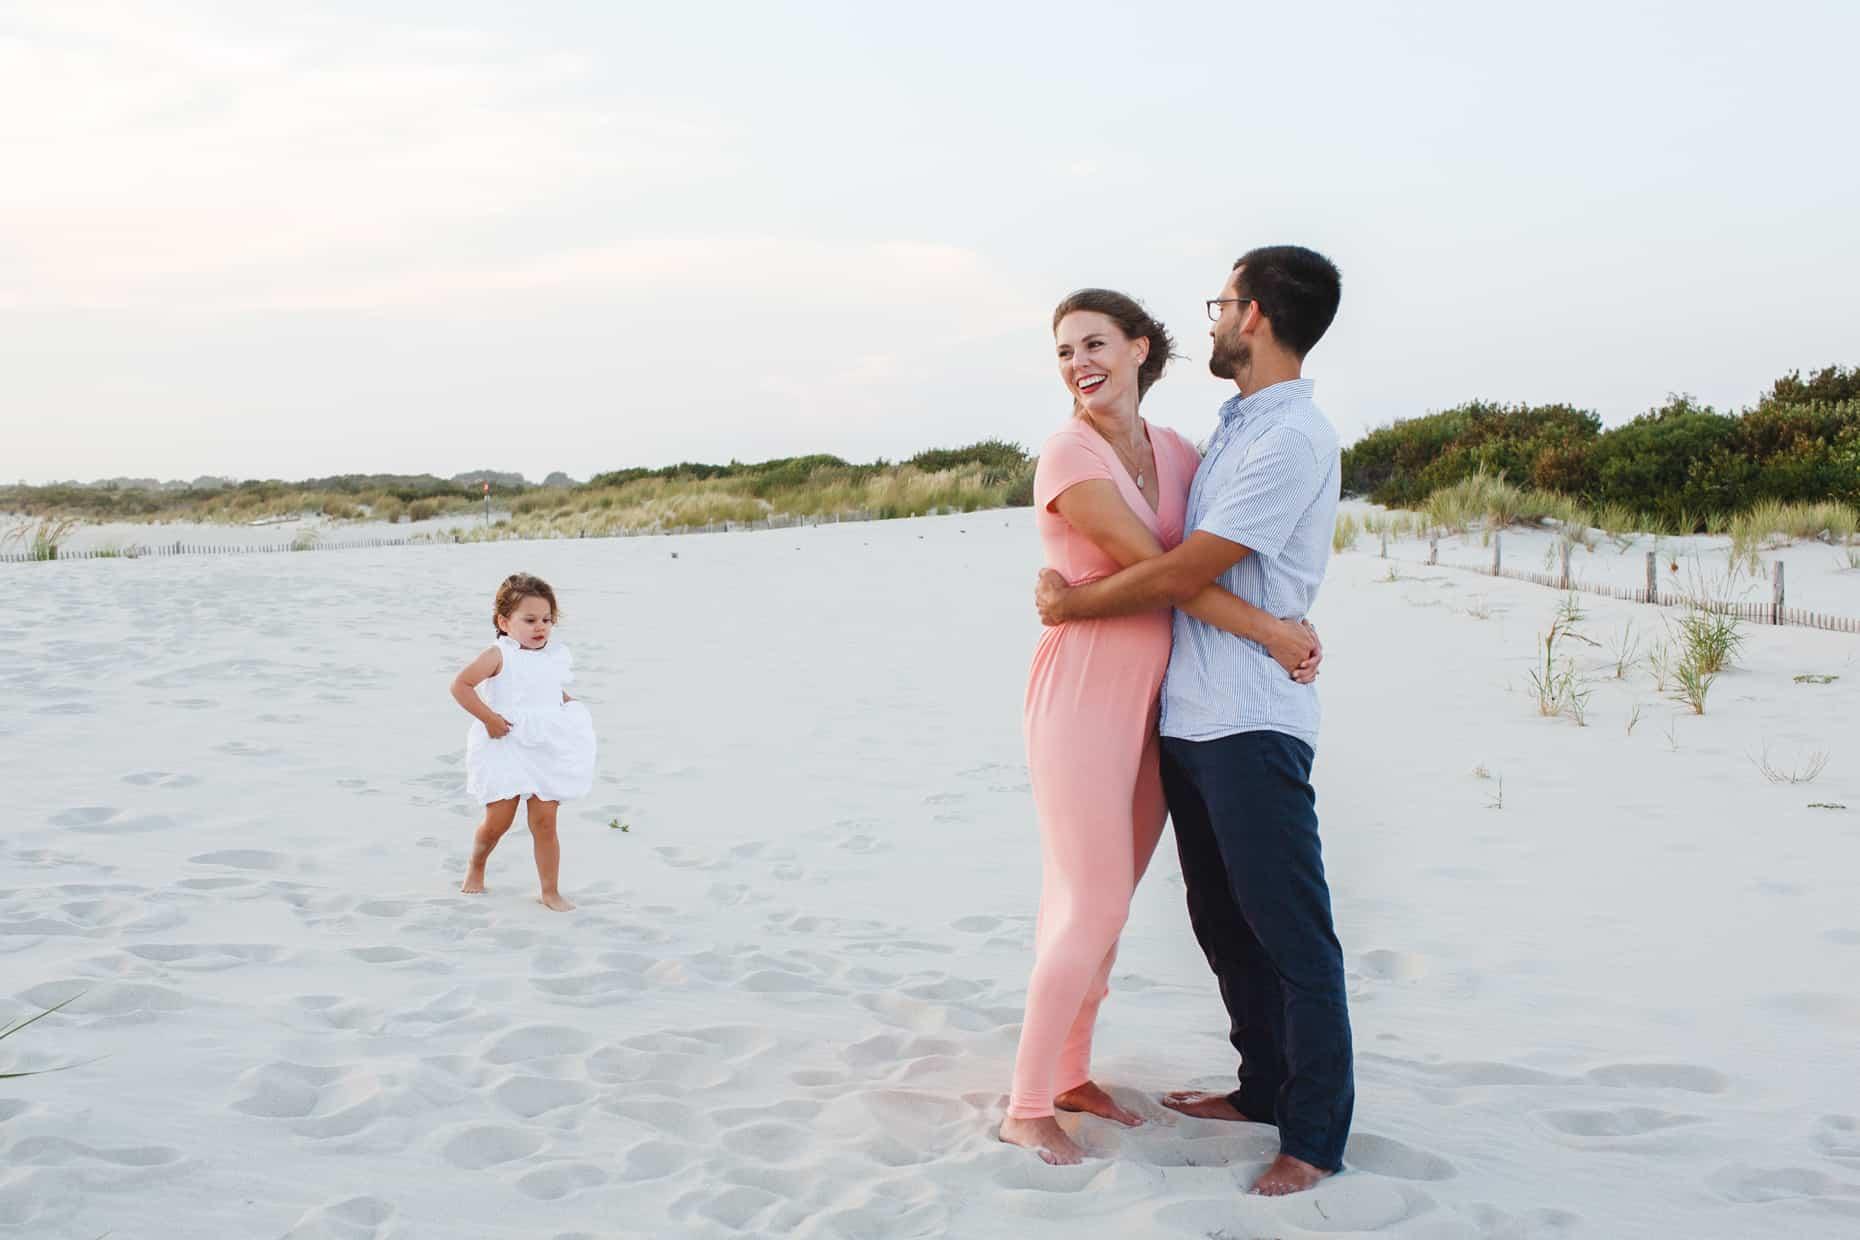 Cape May Beach Vacation Photographers